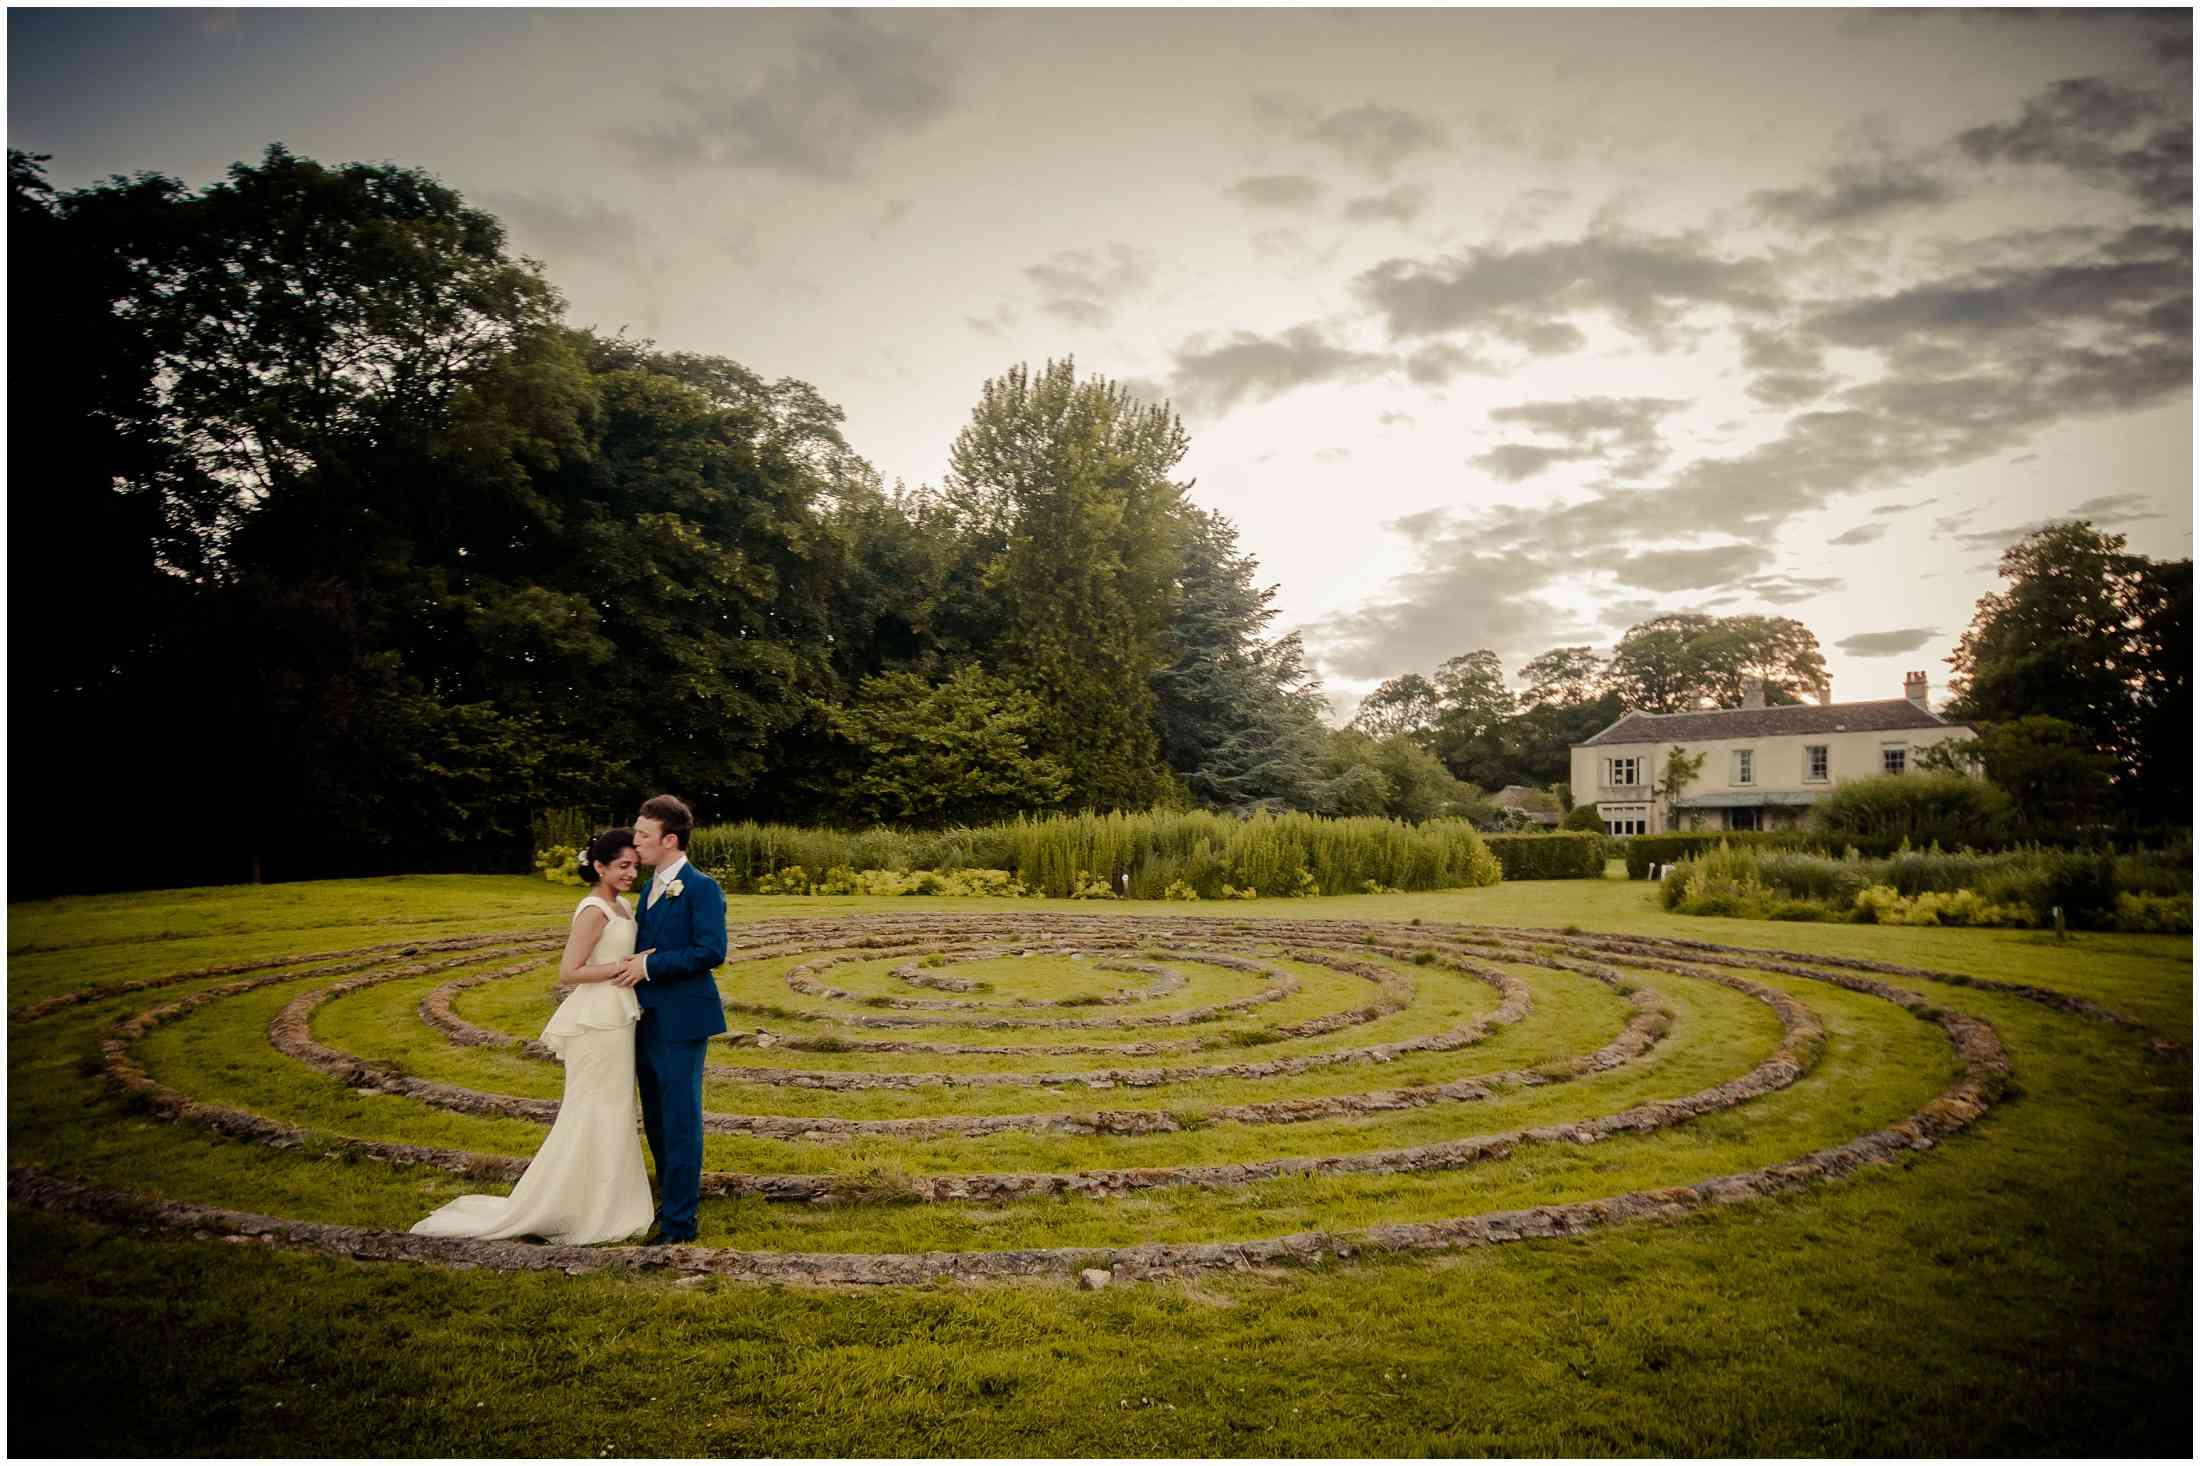 Matara Centre Wedding Photography – Andrew and Sneha